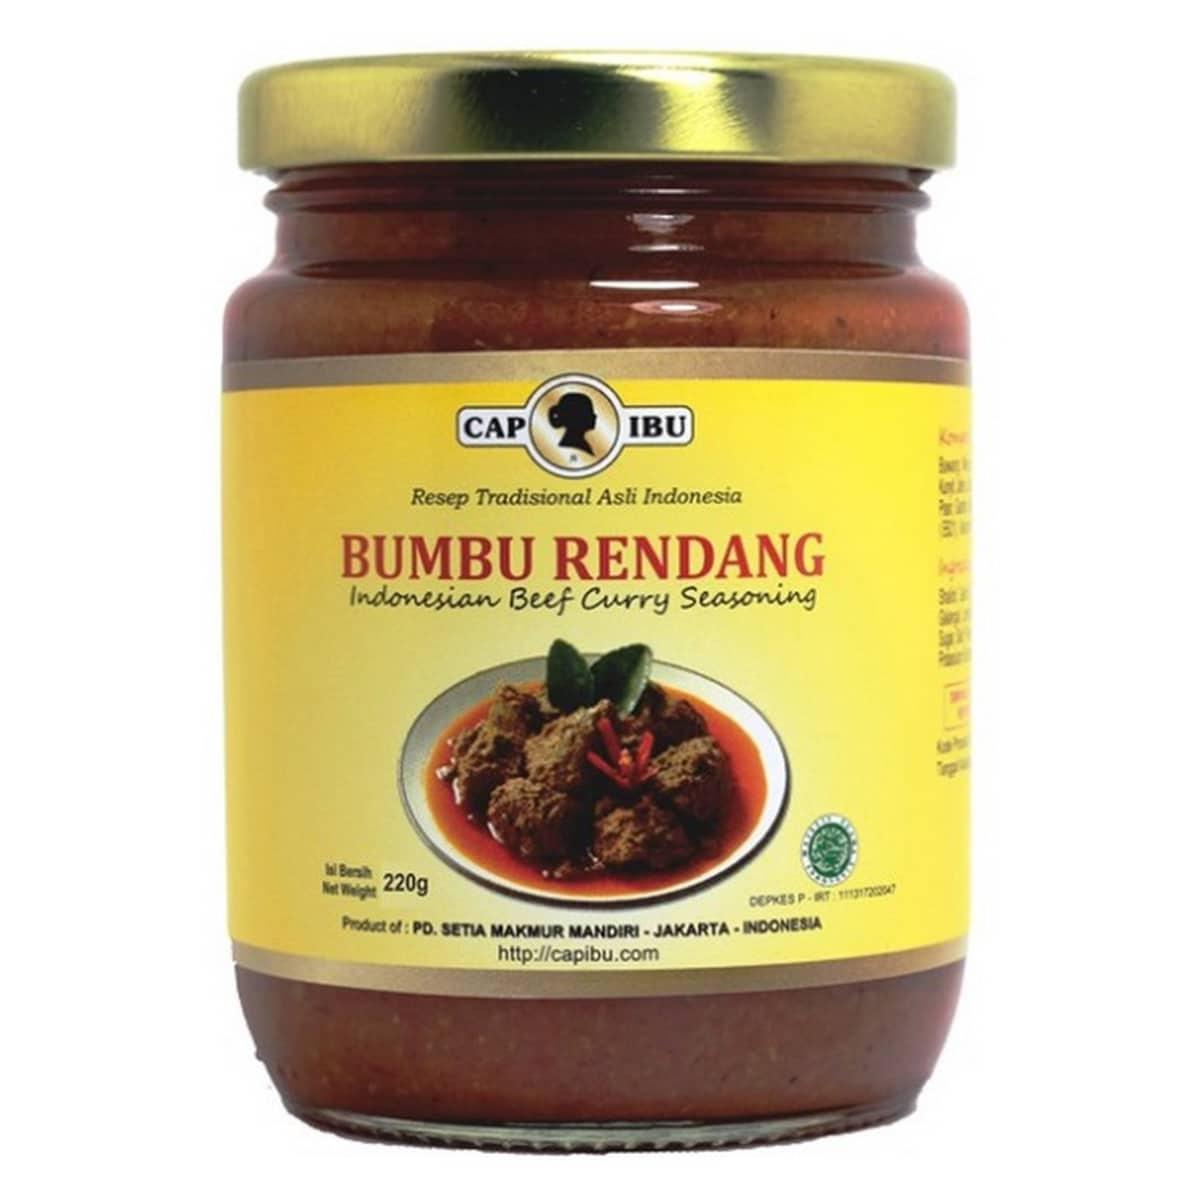 Buy CAP IBU Motherbrand Bumbu Rendang (Indonesian Beef Curry Seasoning) - 220 gm